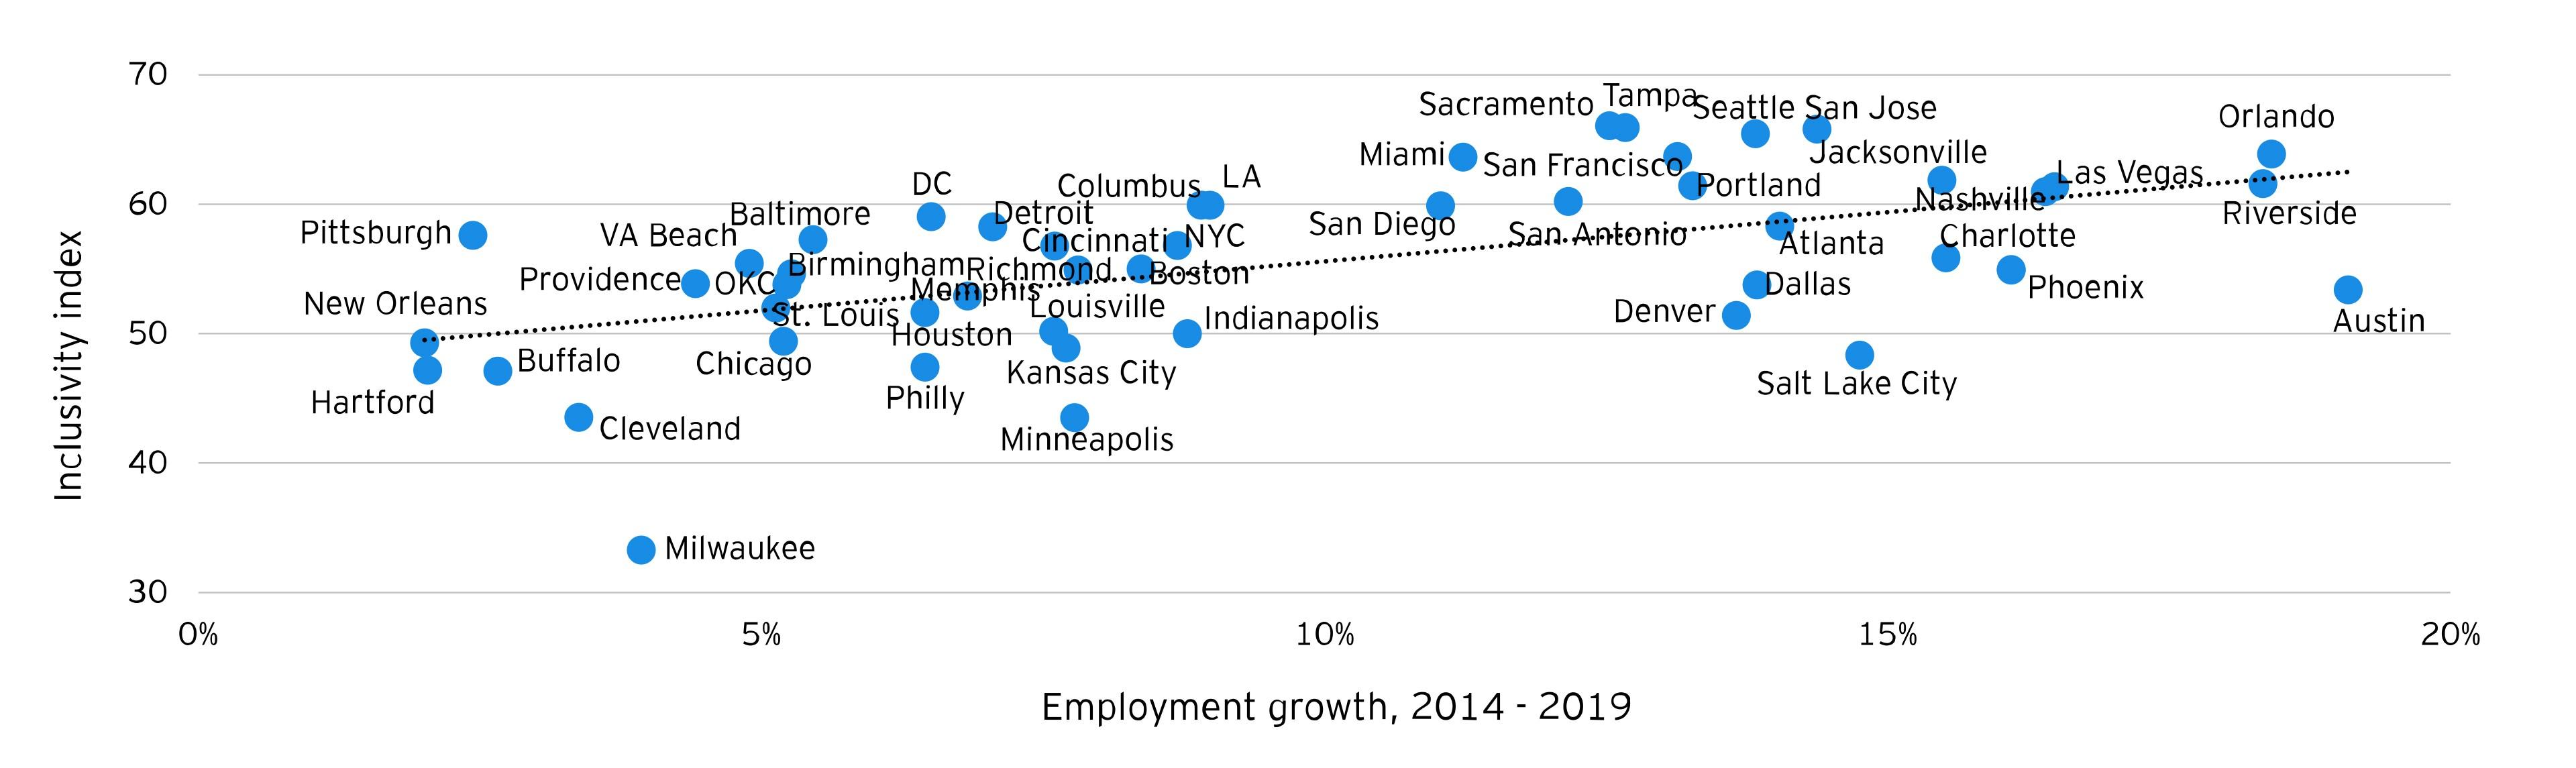 Employee growth dot chart